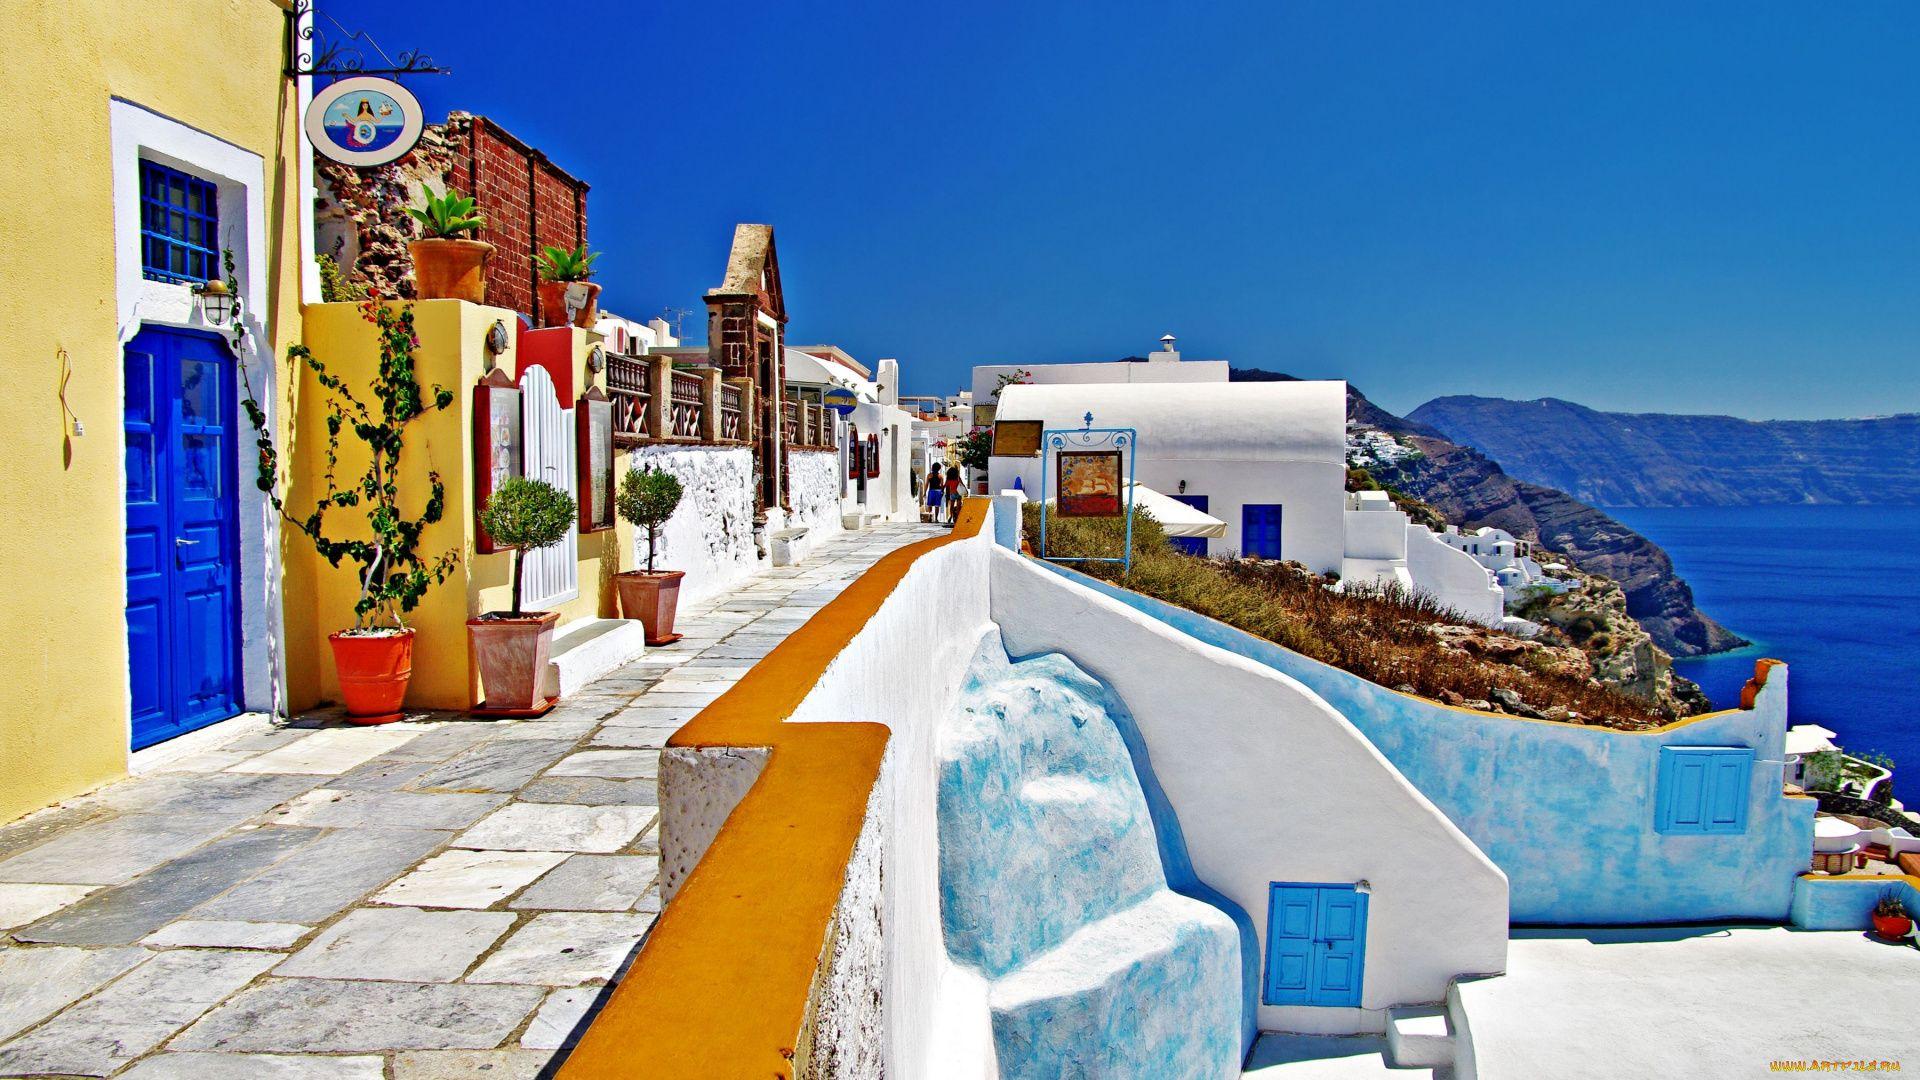 Santorini full hd 1080p wallpaper